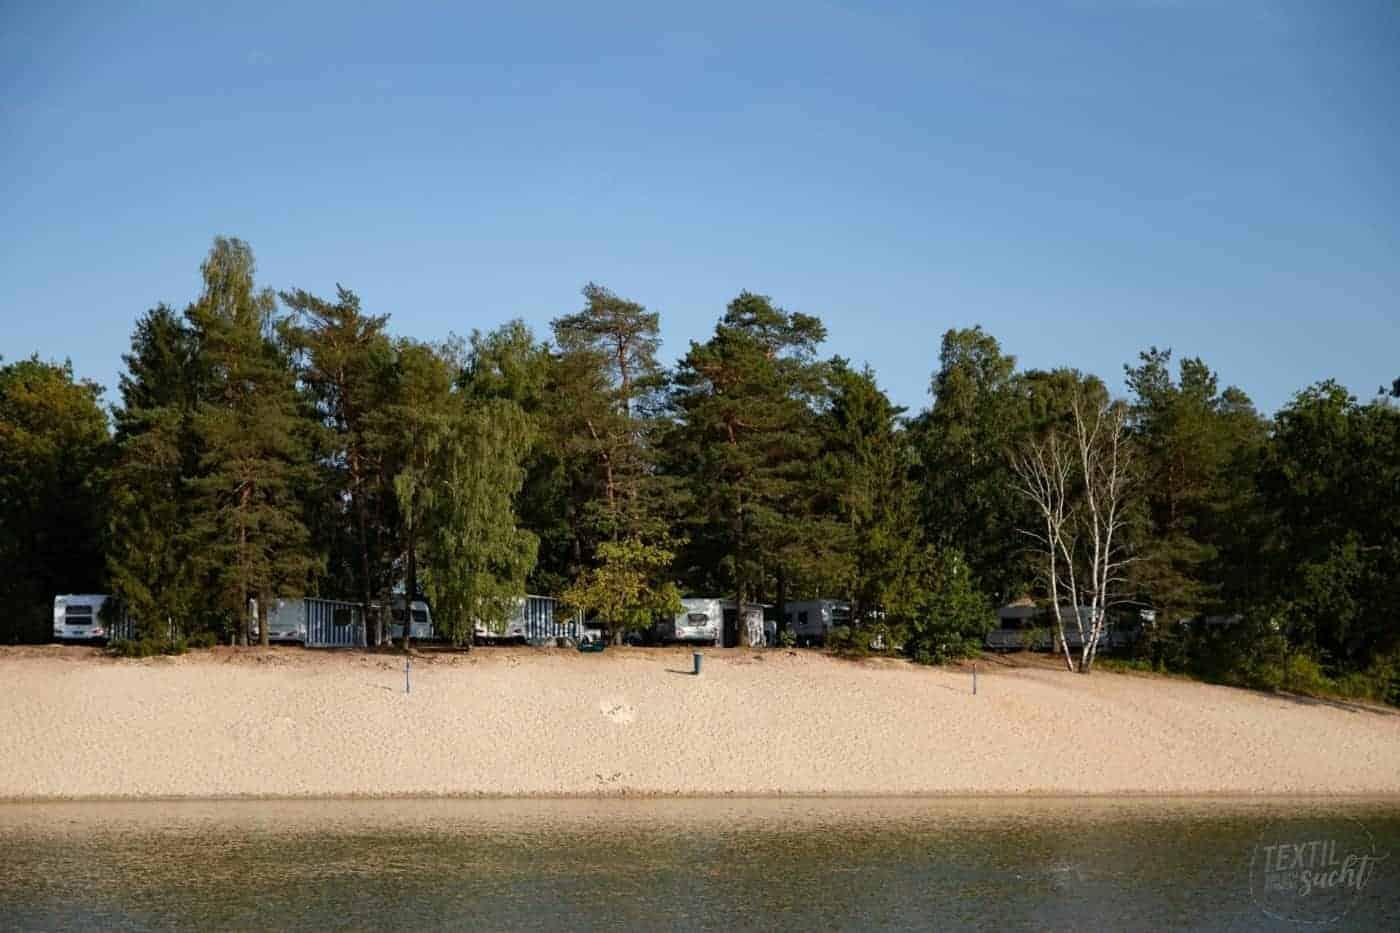 Südsee Camp